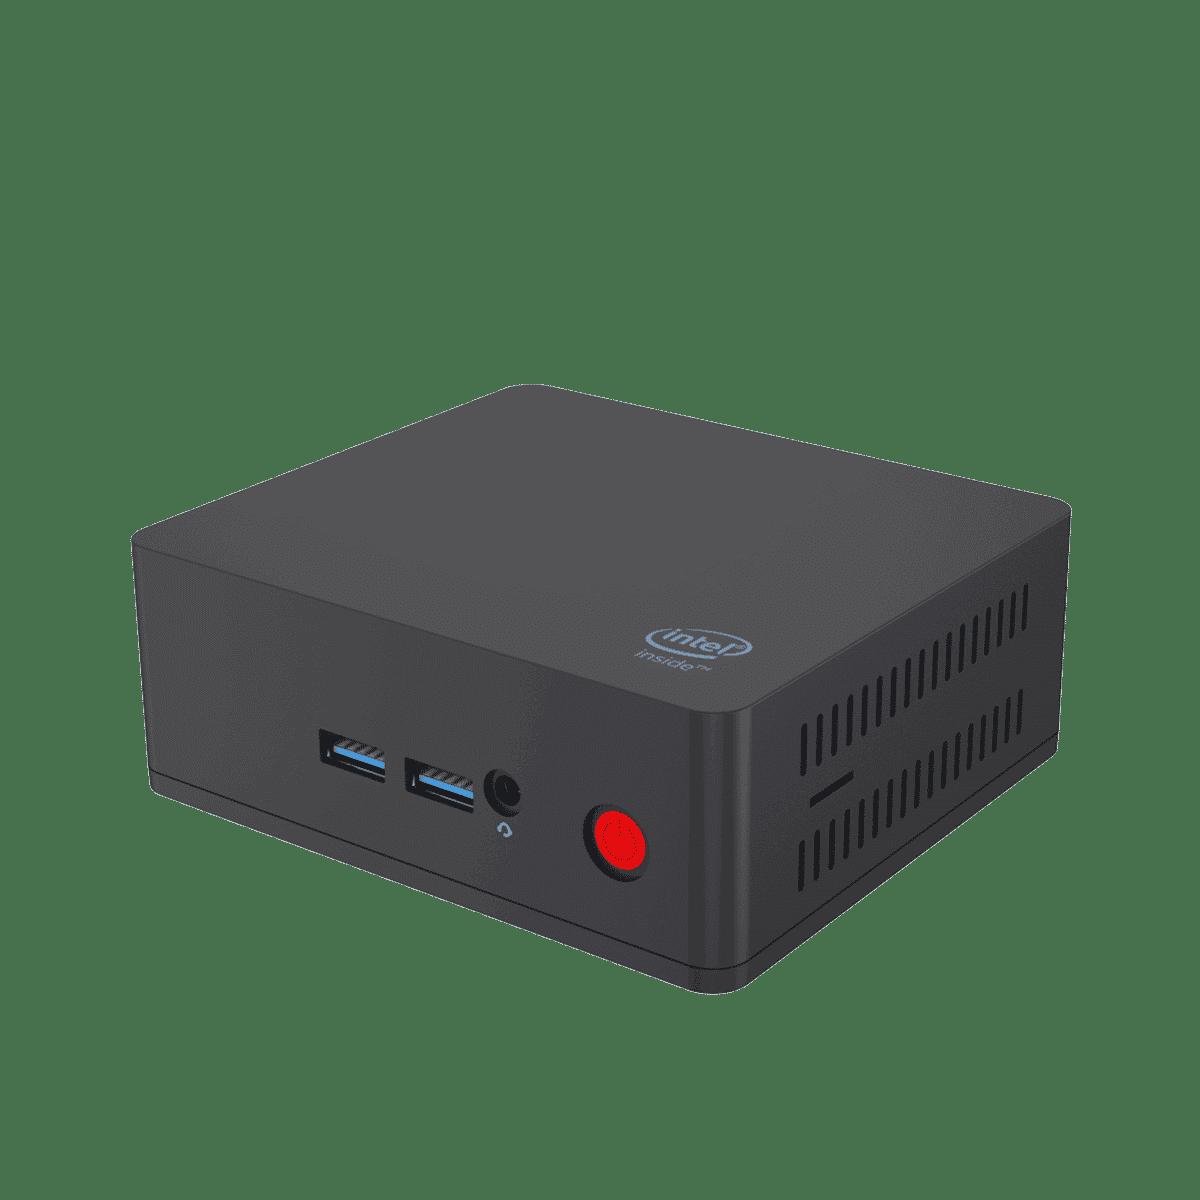 Beelink AP45 Windows PC usb 3.0 port a 3.5mm port